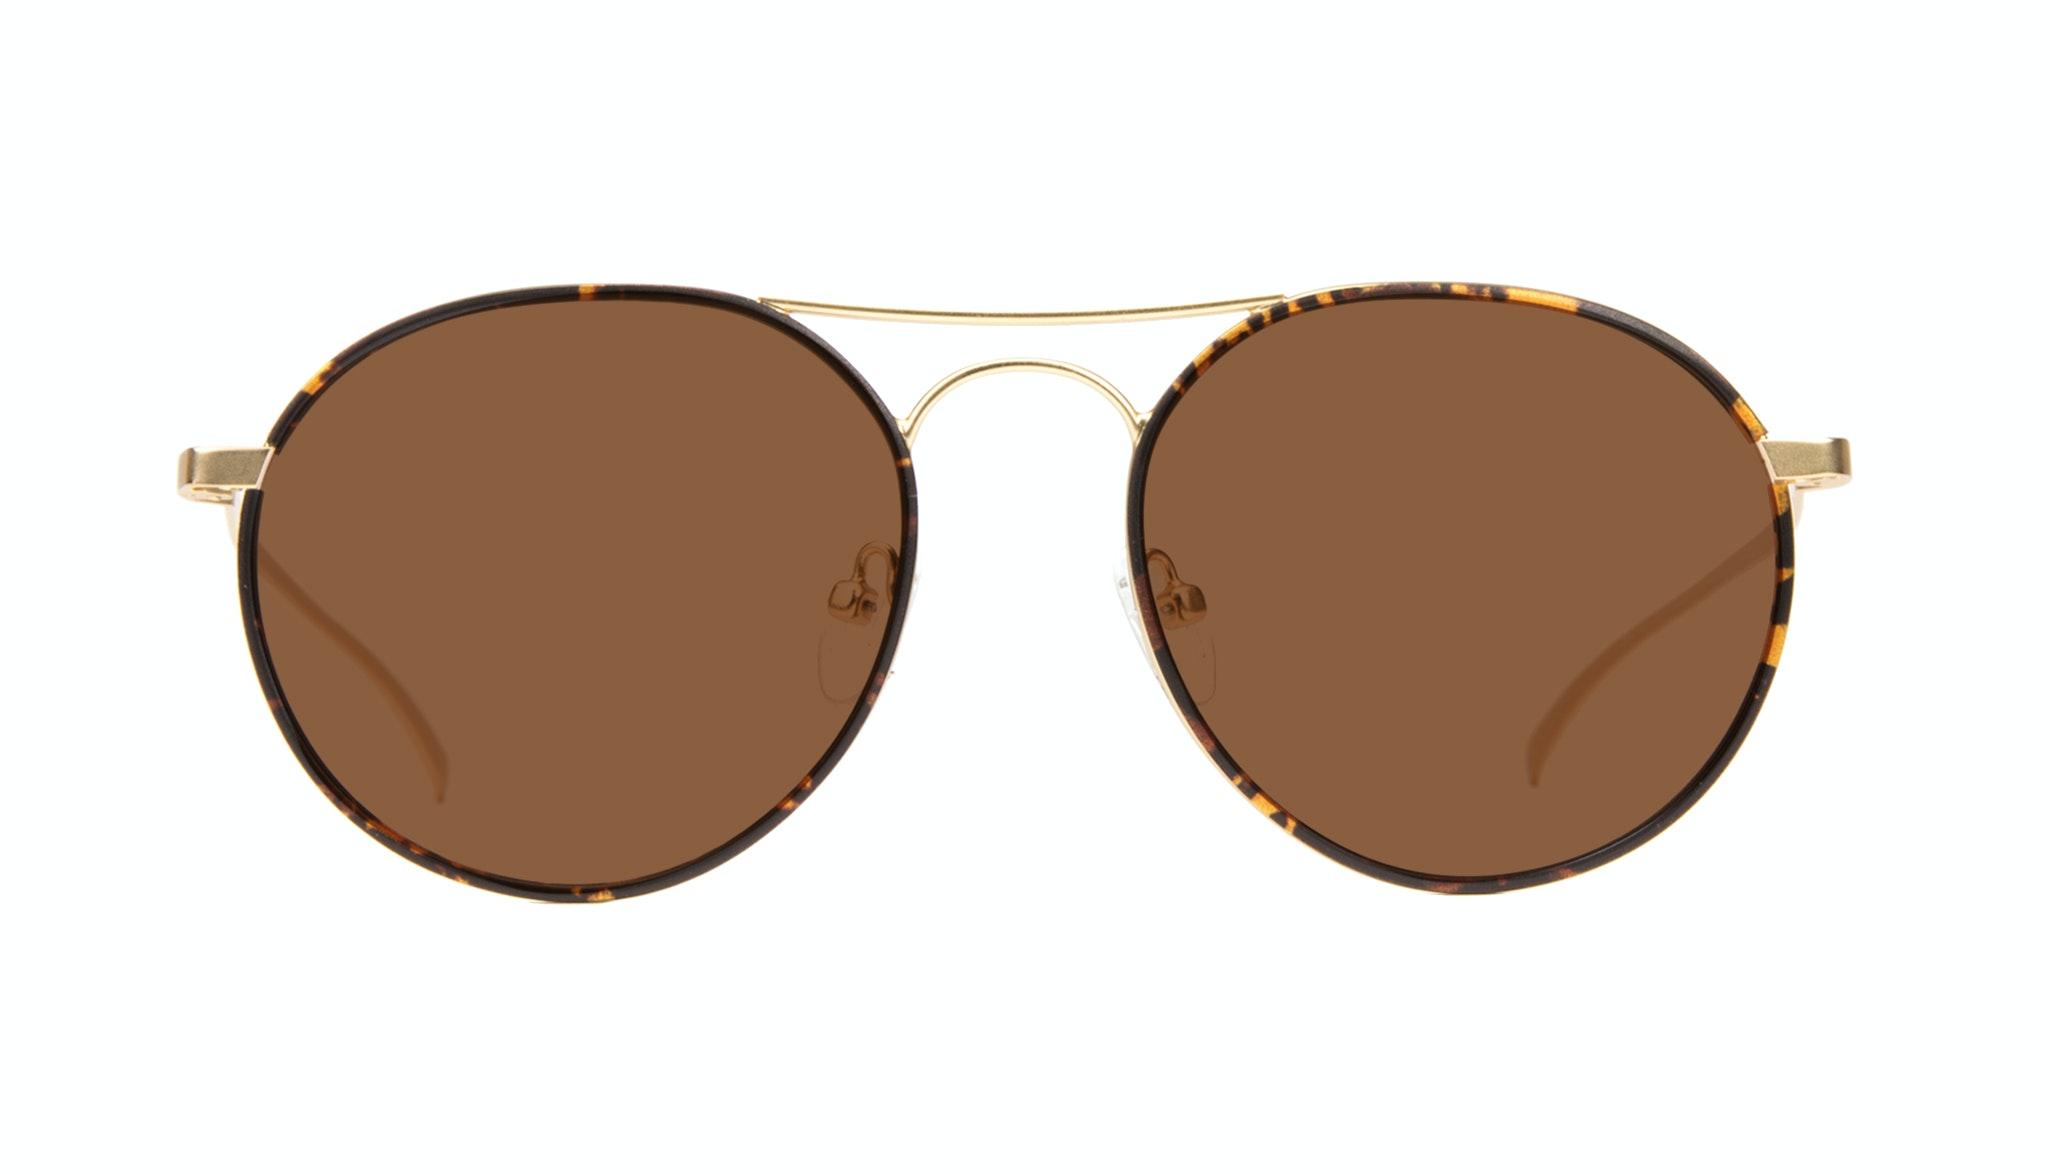 Affordable Fashion Glasses Aviator Round Sunglasses Men Contour Tortoise Front